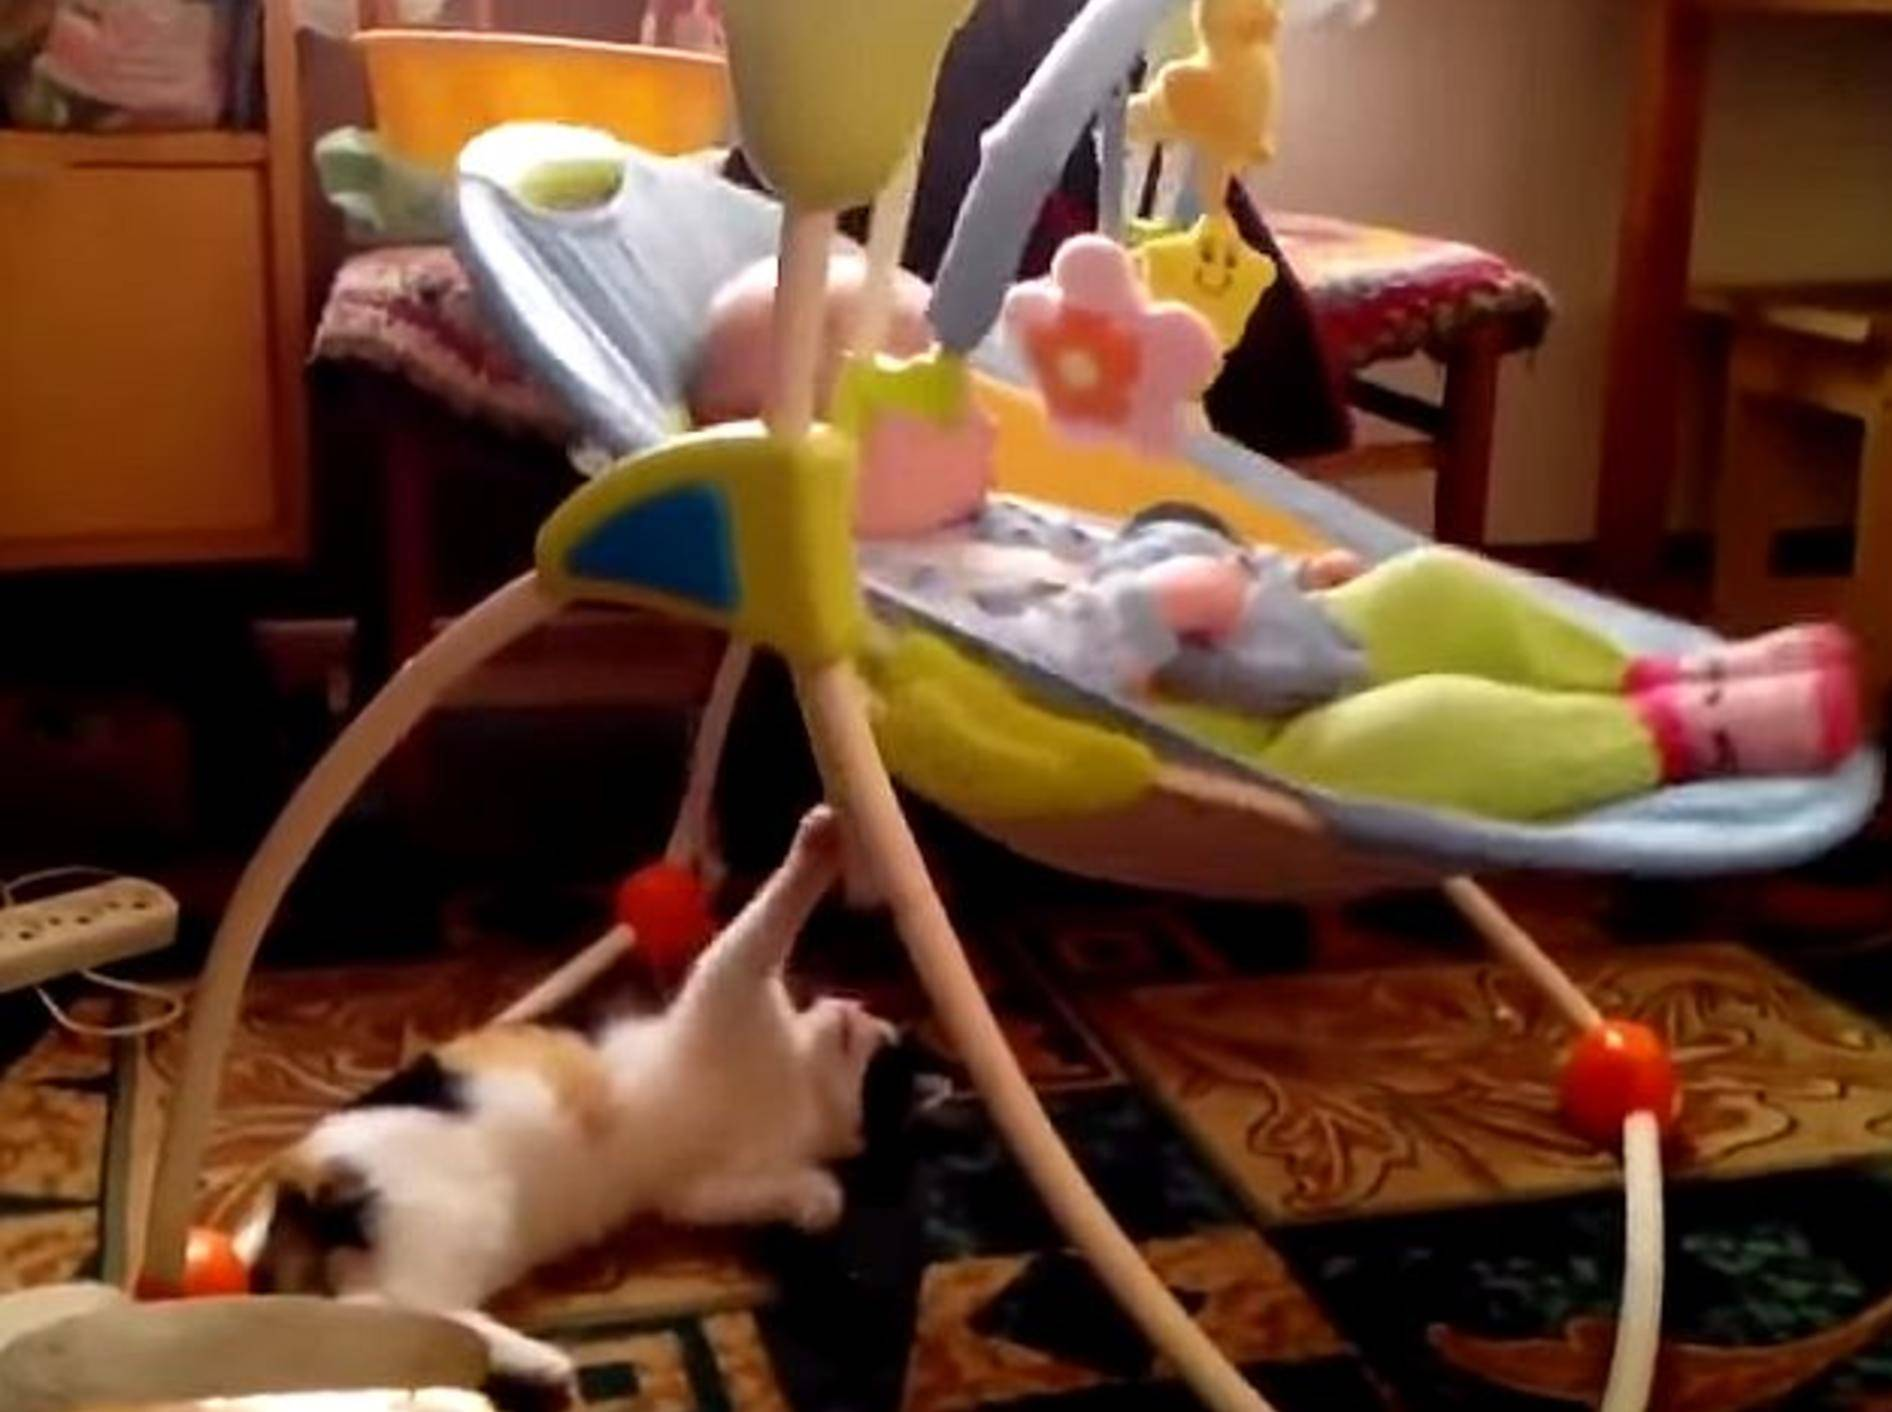 Liebe Katze schaukelt Baby – Bild: Youtube / Viralistas.com